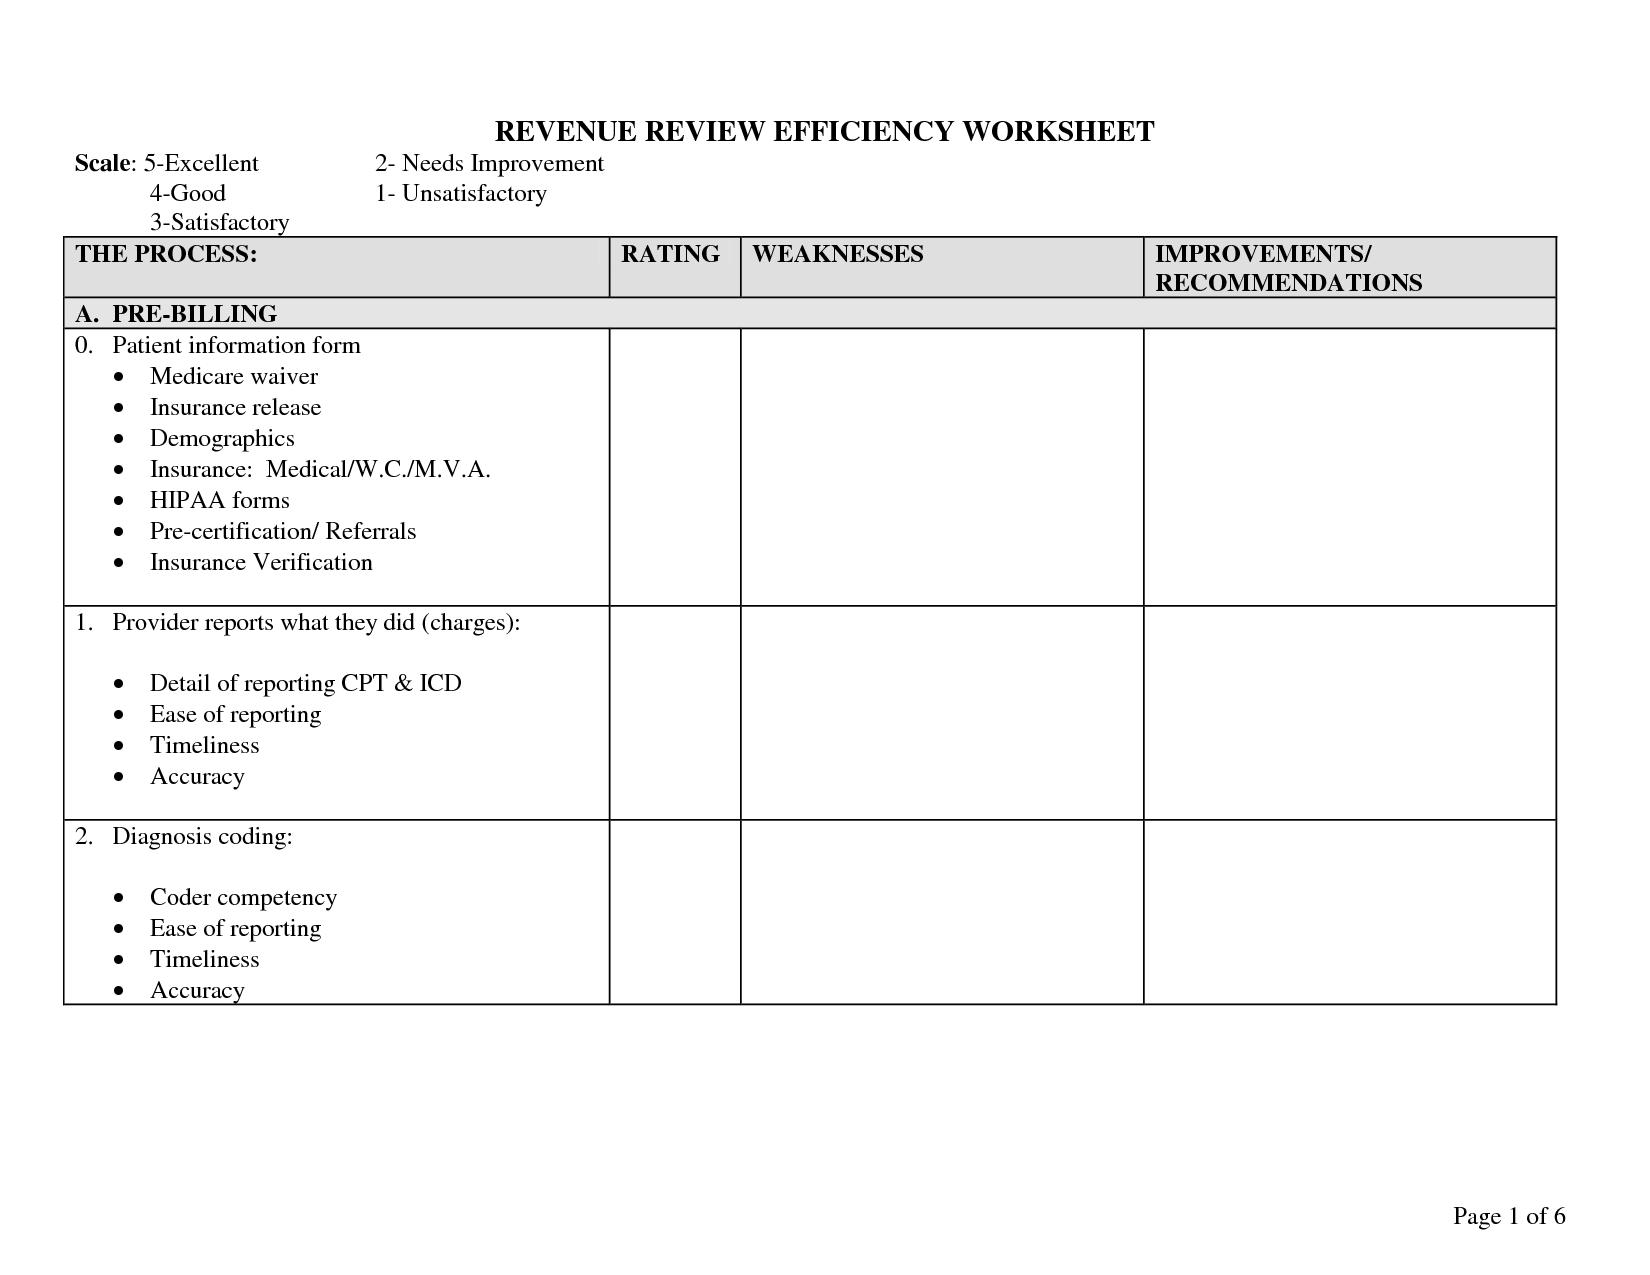 33 Checks And Balances Worksheet